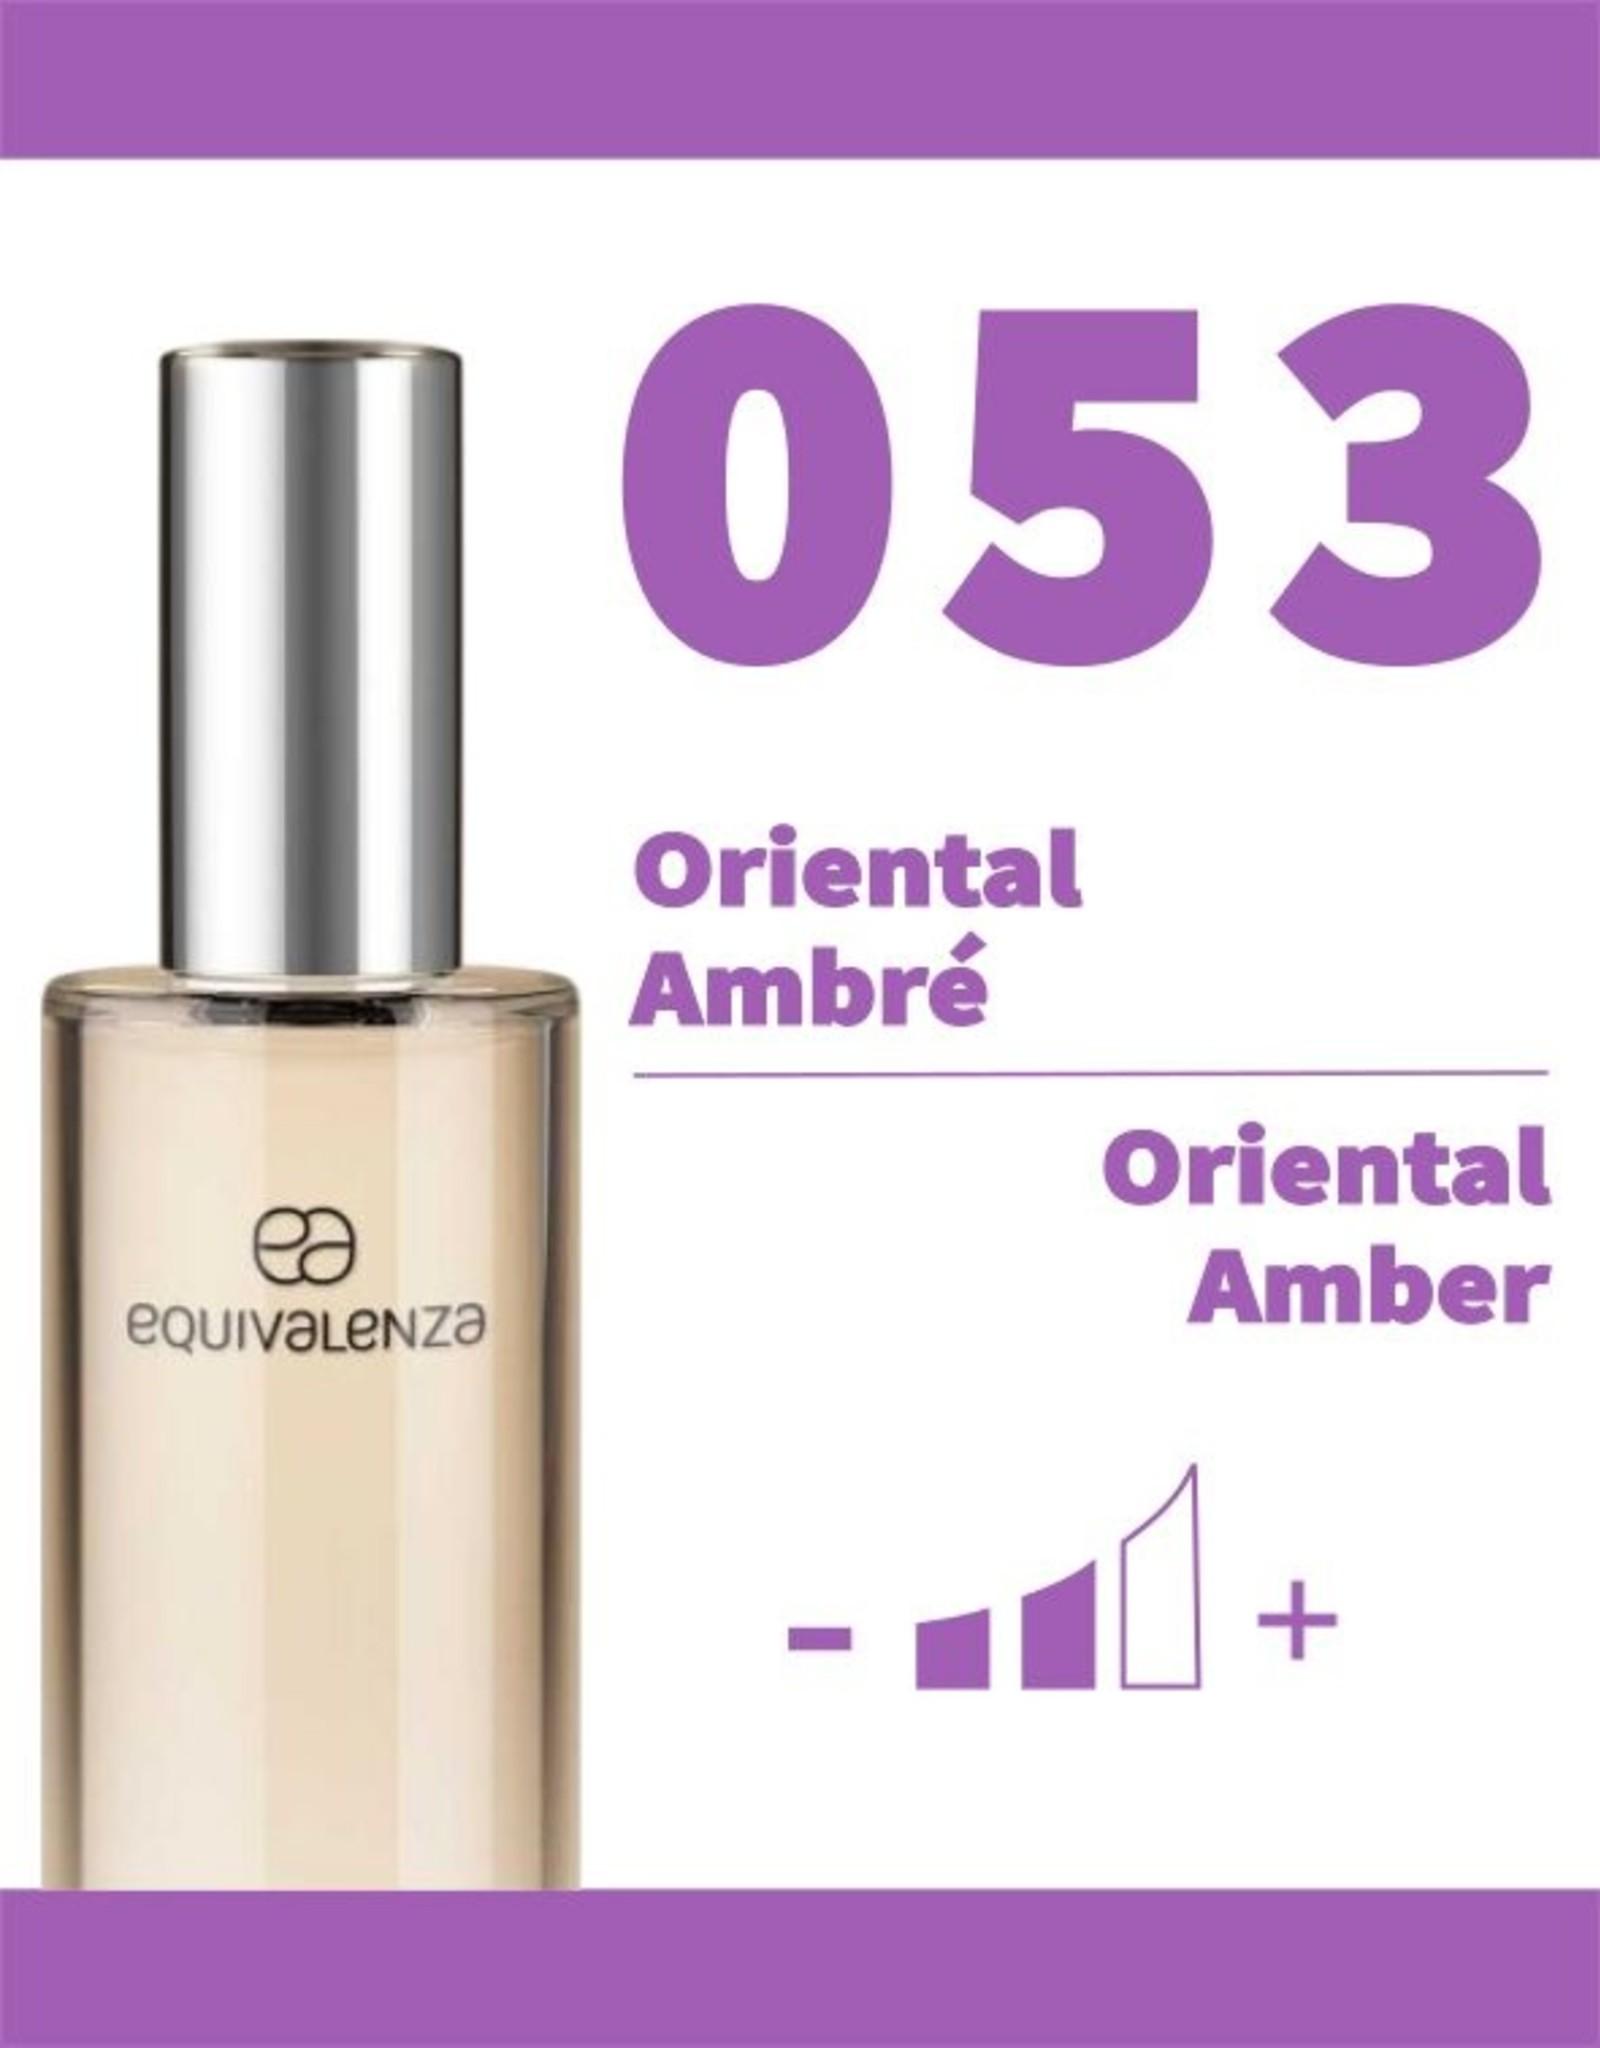 Equivalenza Eau de Toilette Oriental Amber 053